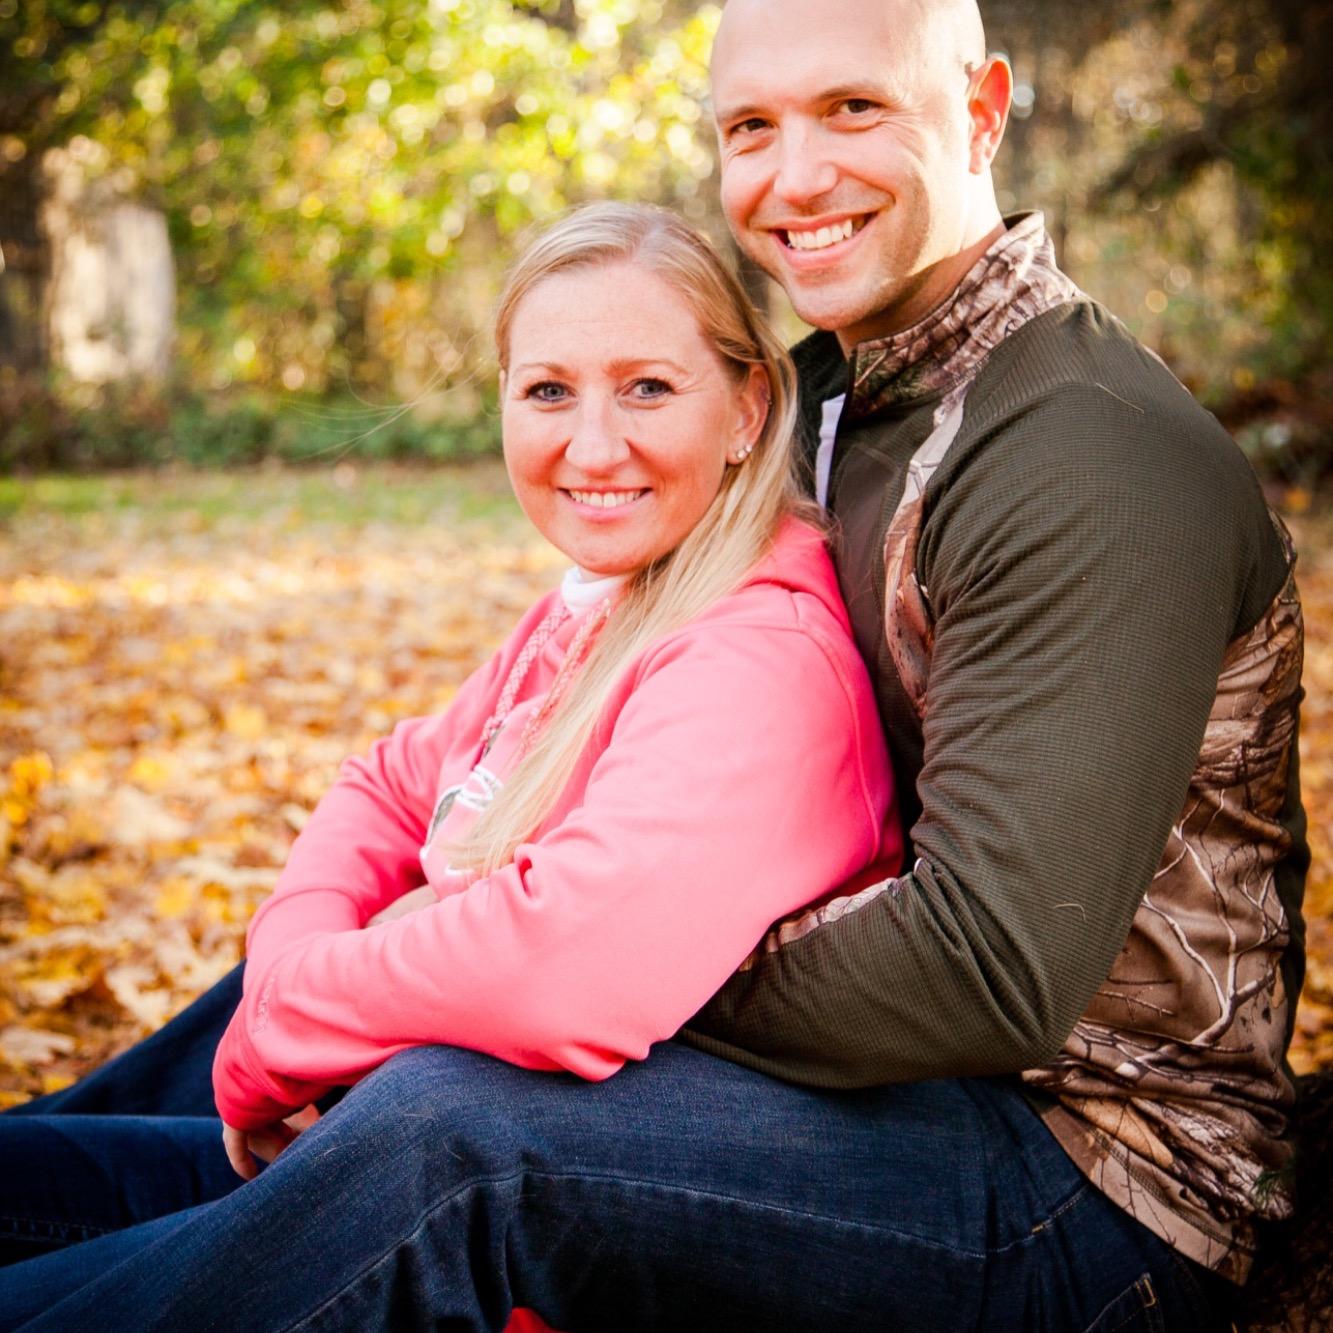 Lisa DeVisser and Travis Thompson - Wedding Registry - Amazon.com